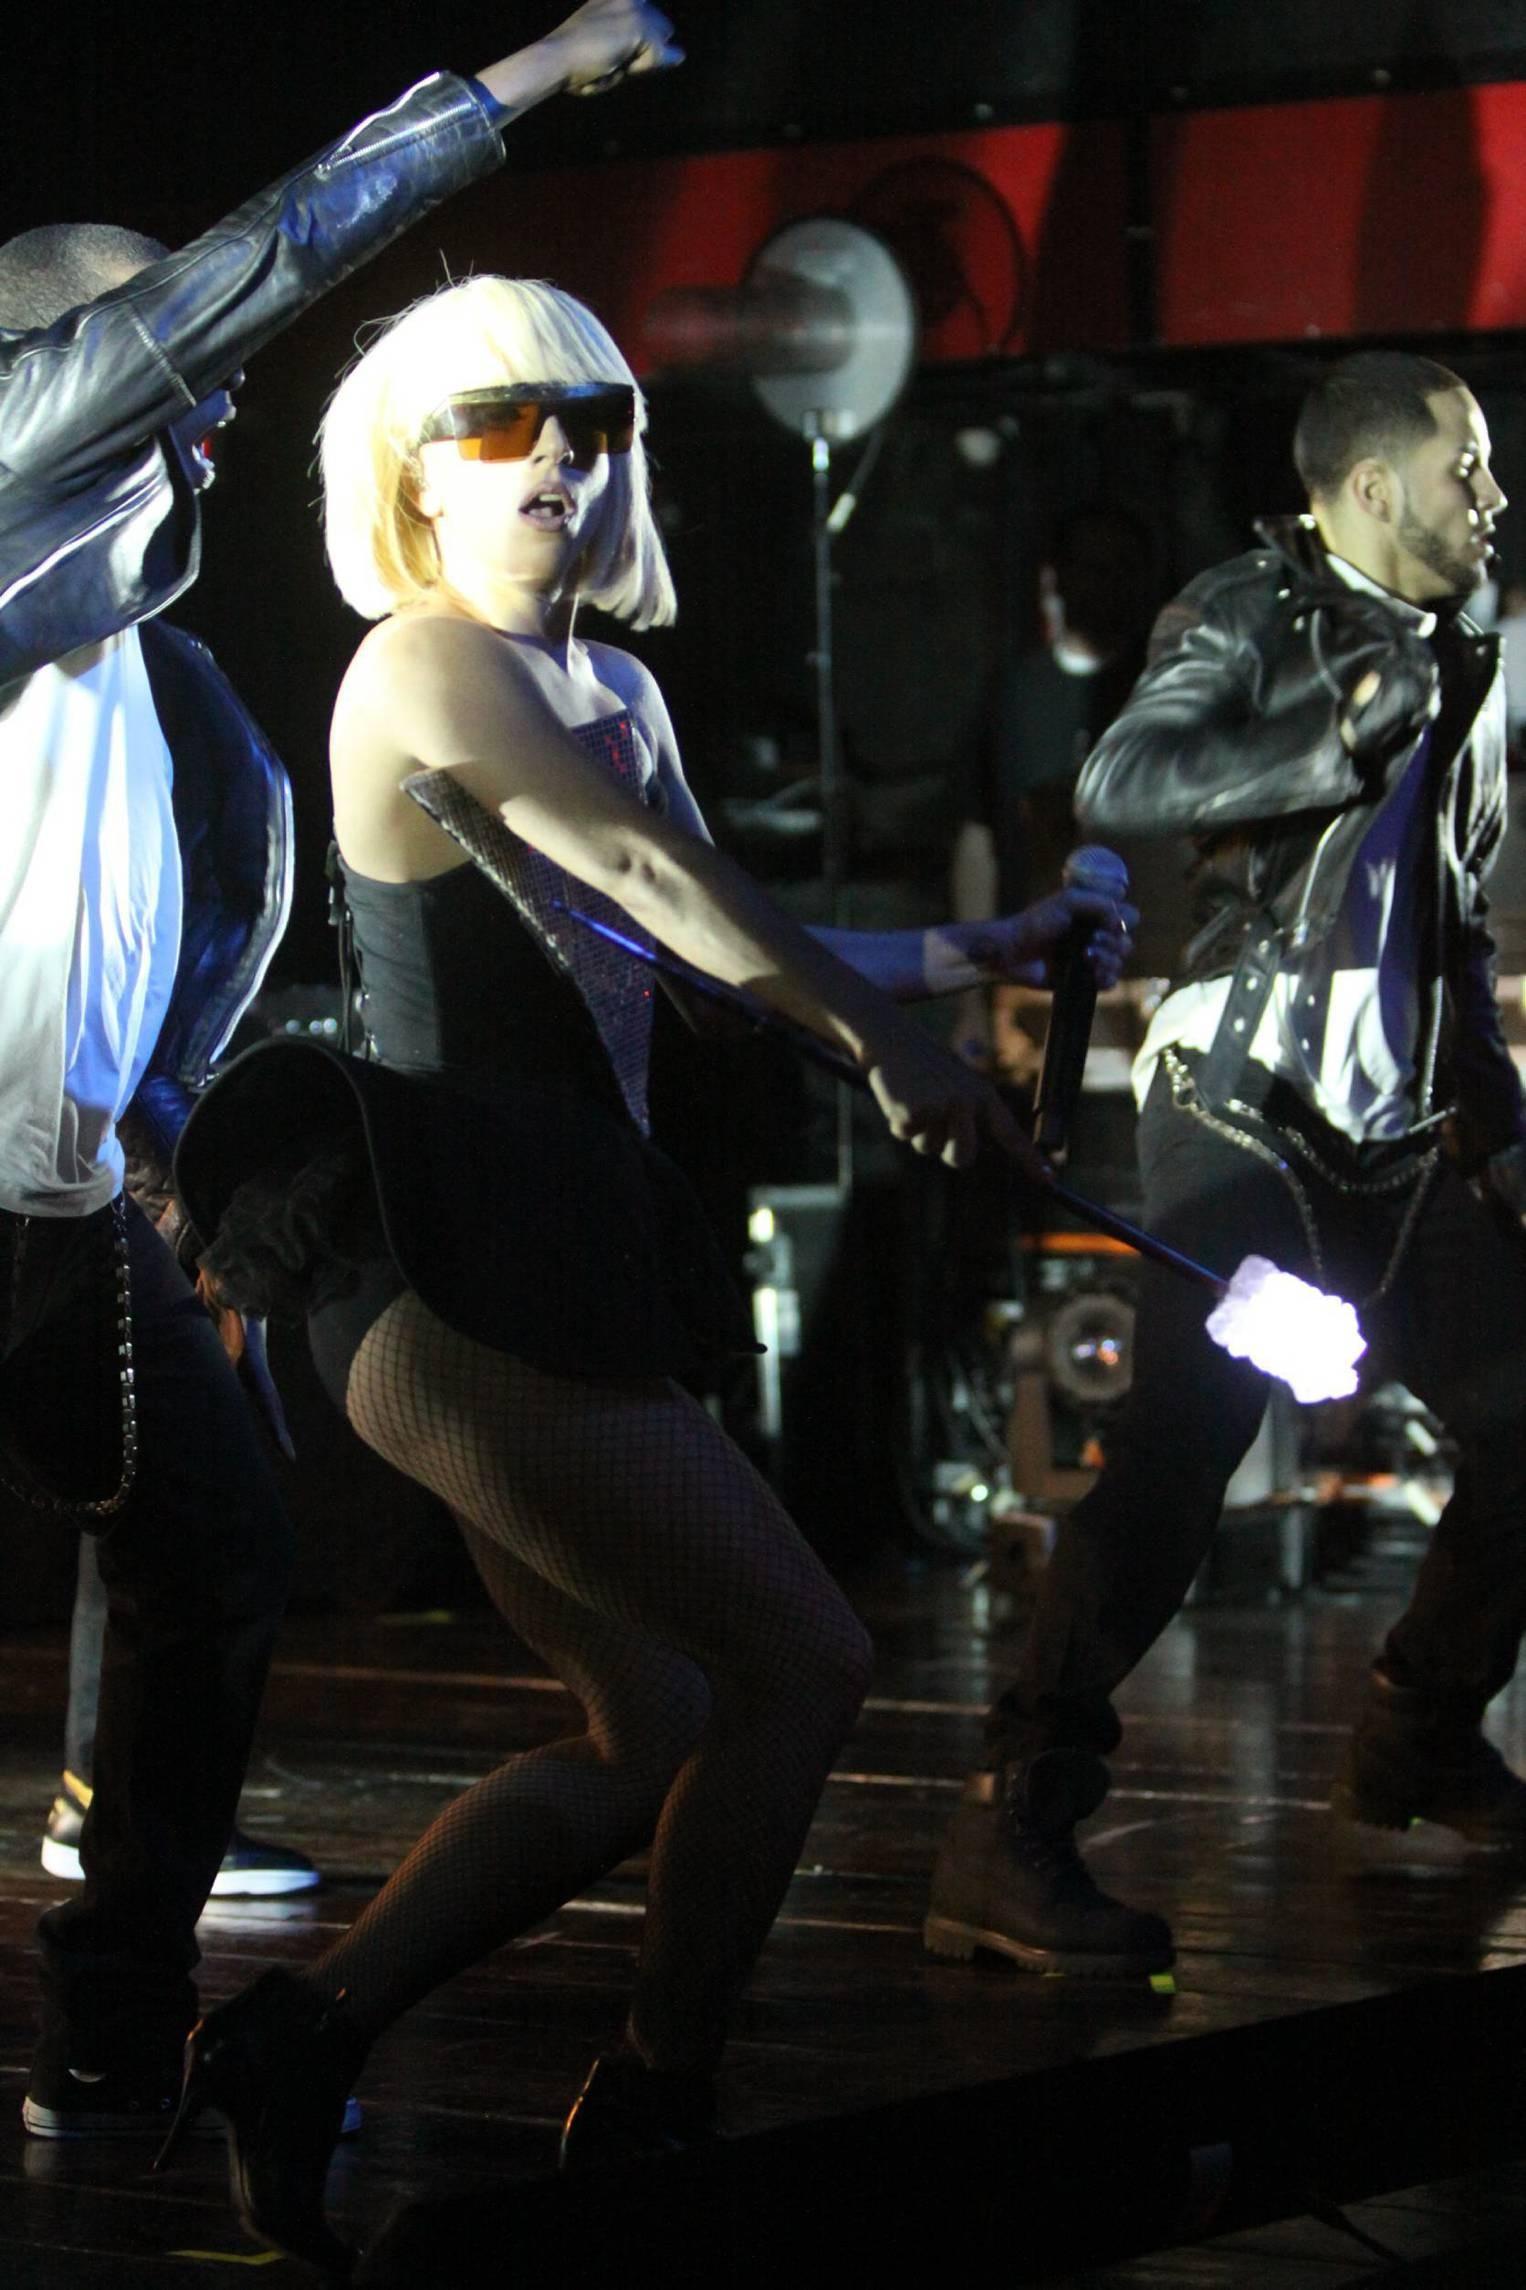 84032_Lady_GaGa_performs_at_Fort_Lauderdale-5_122_468lo.jpg